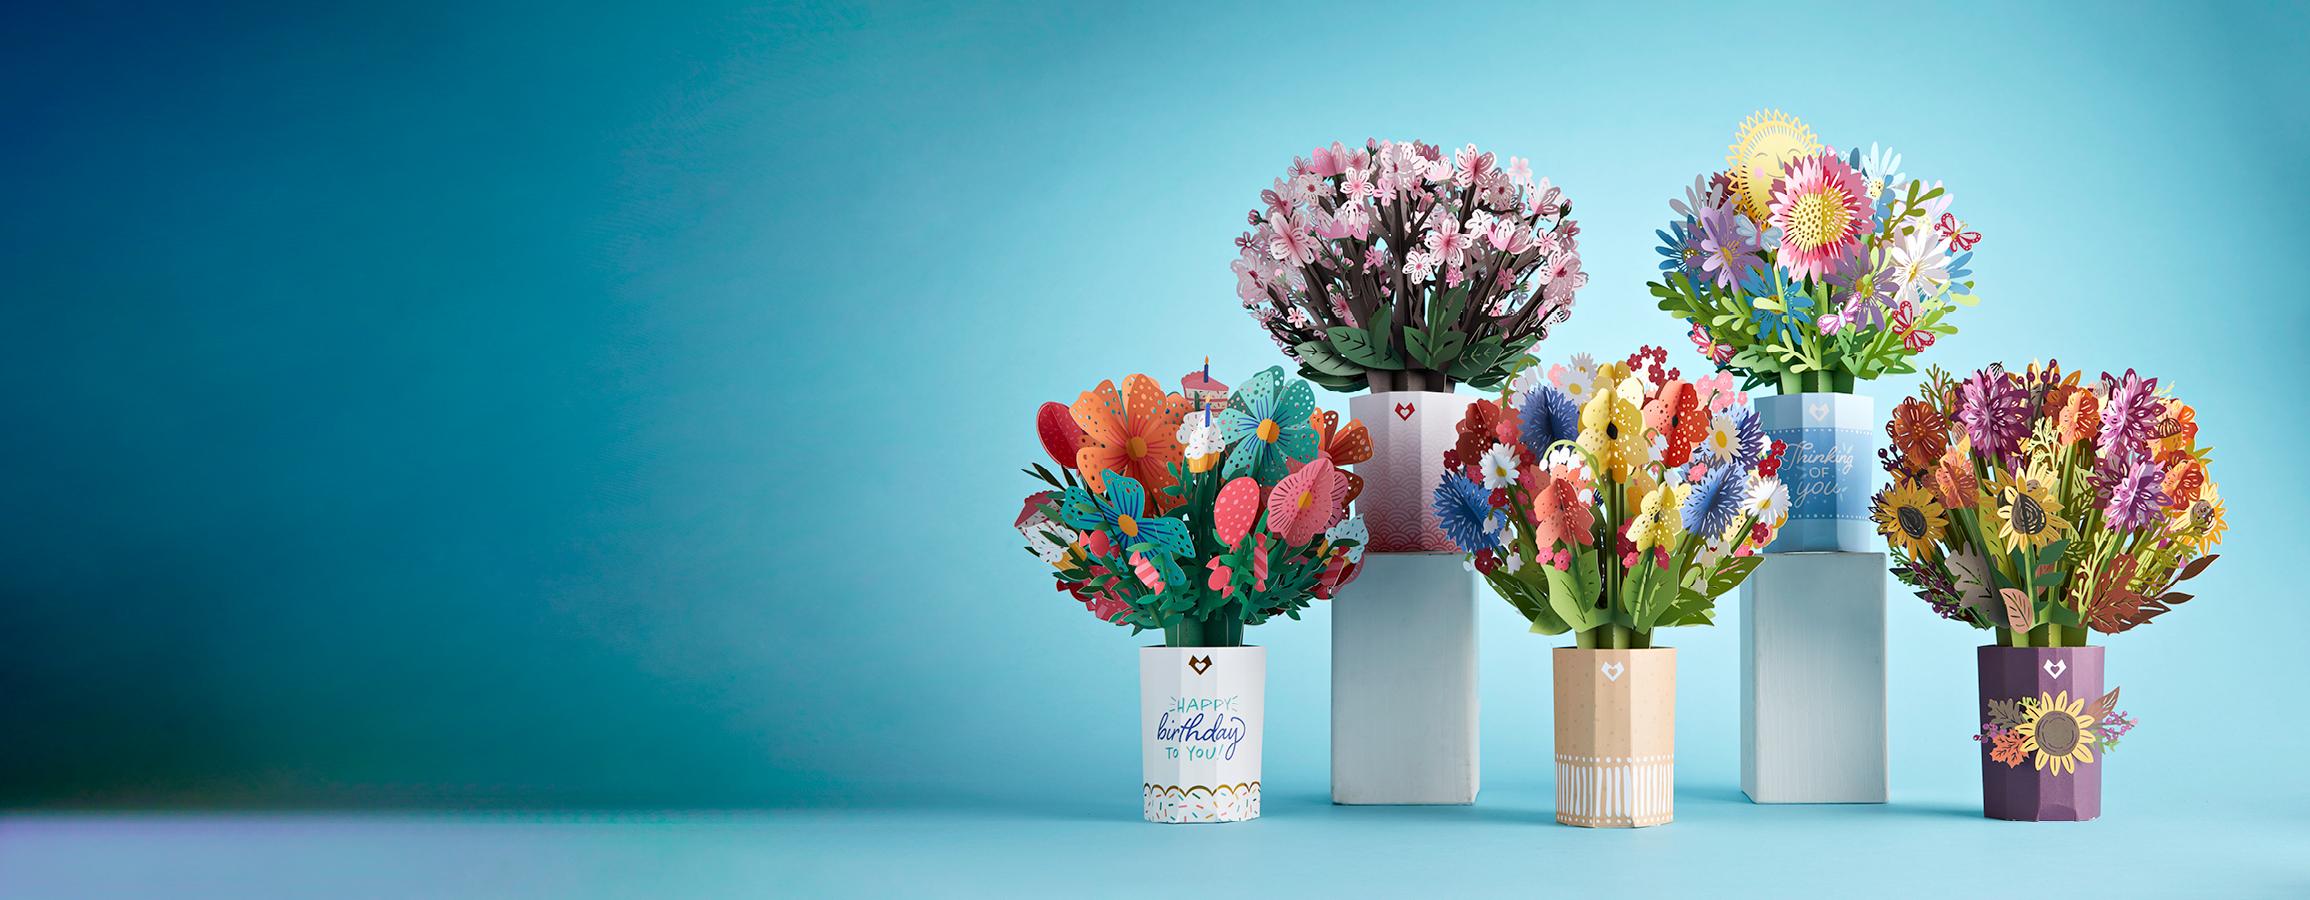 pop-up-flower-bouquets-lovepop